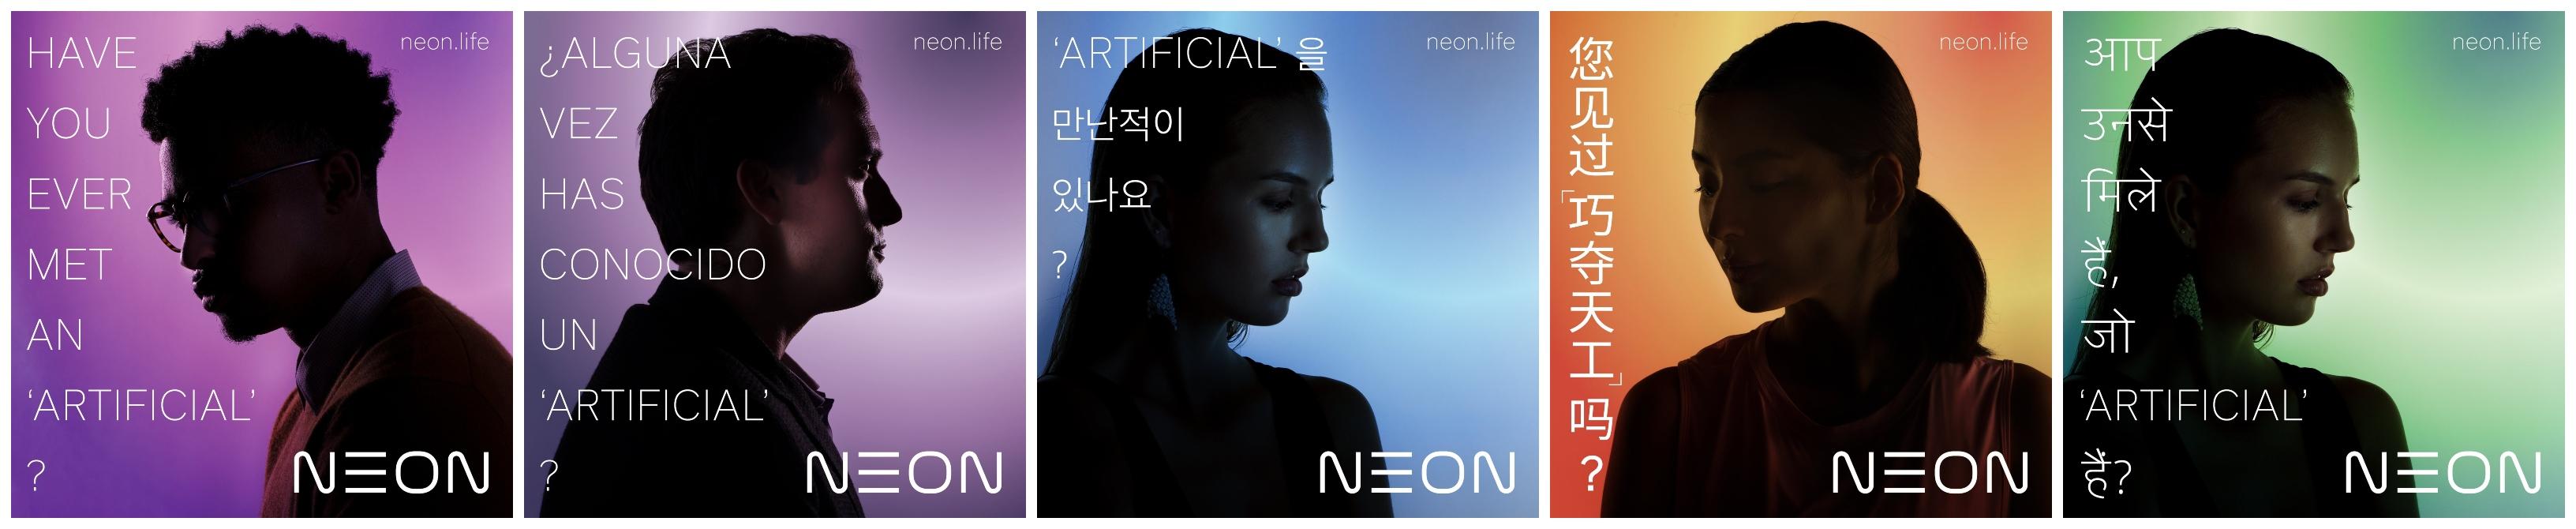 Samsung NEON proiect inteligenta artificiala